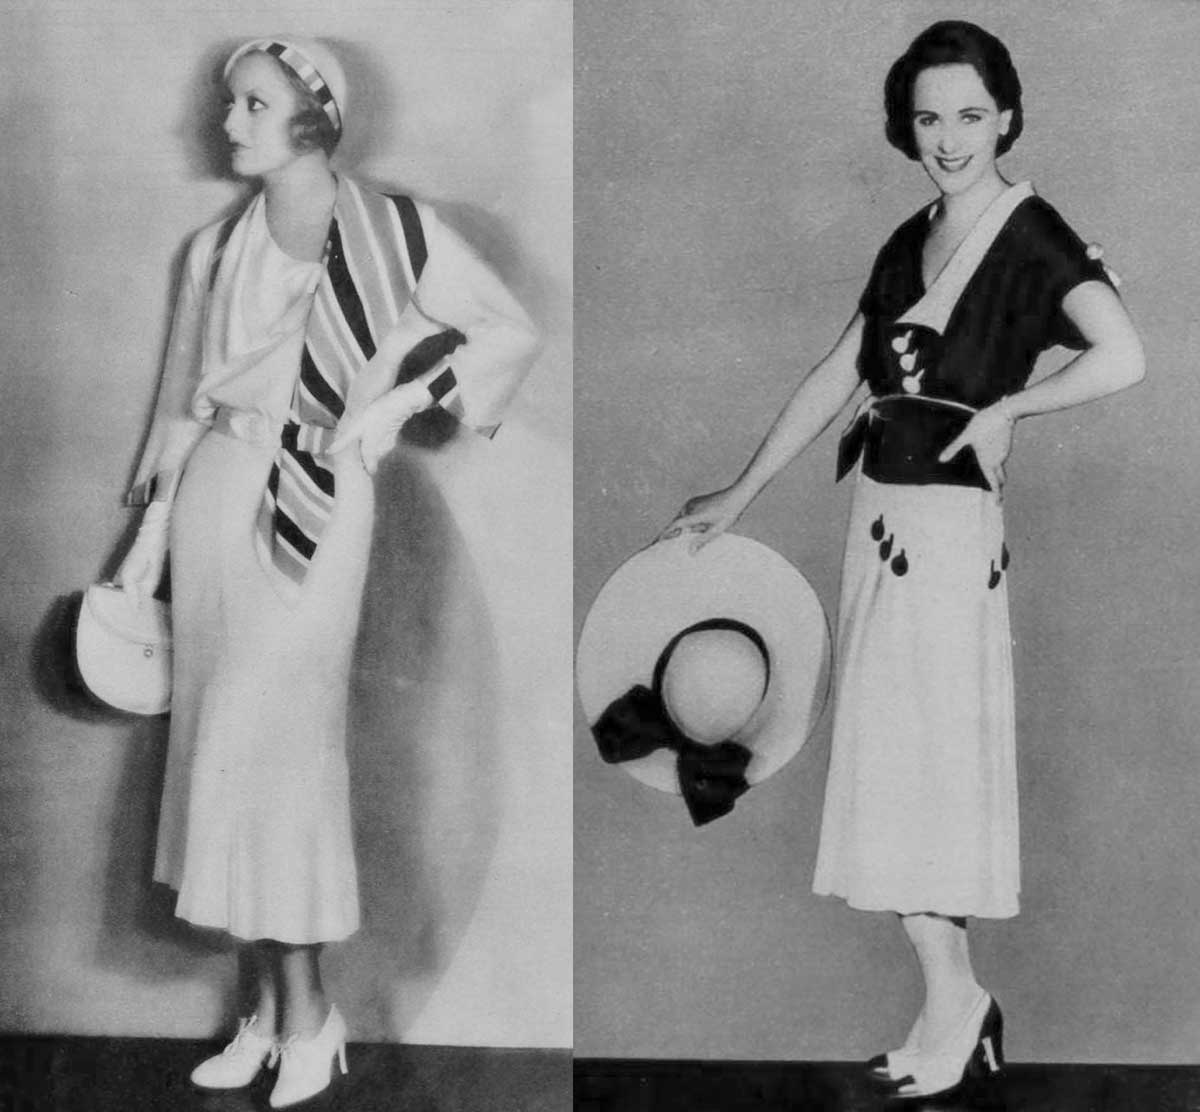 Summer-Styles-Hollywood-1931--Joan-Crawford-and-Rose-Hobart